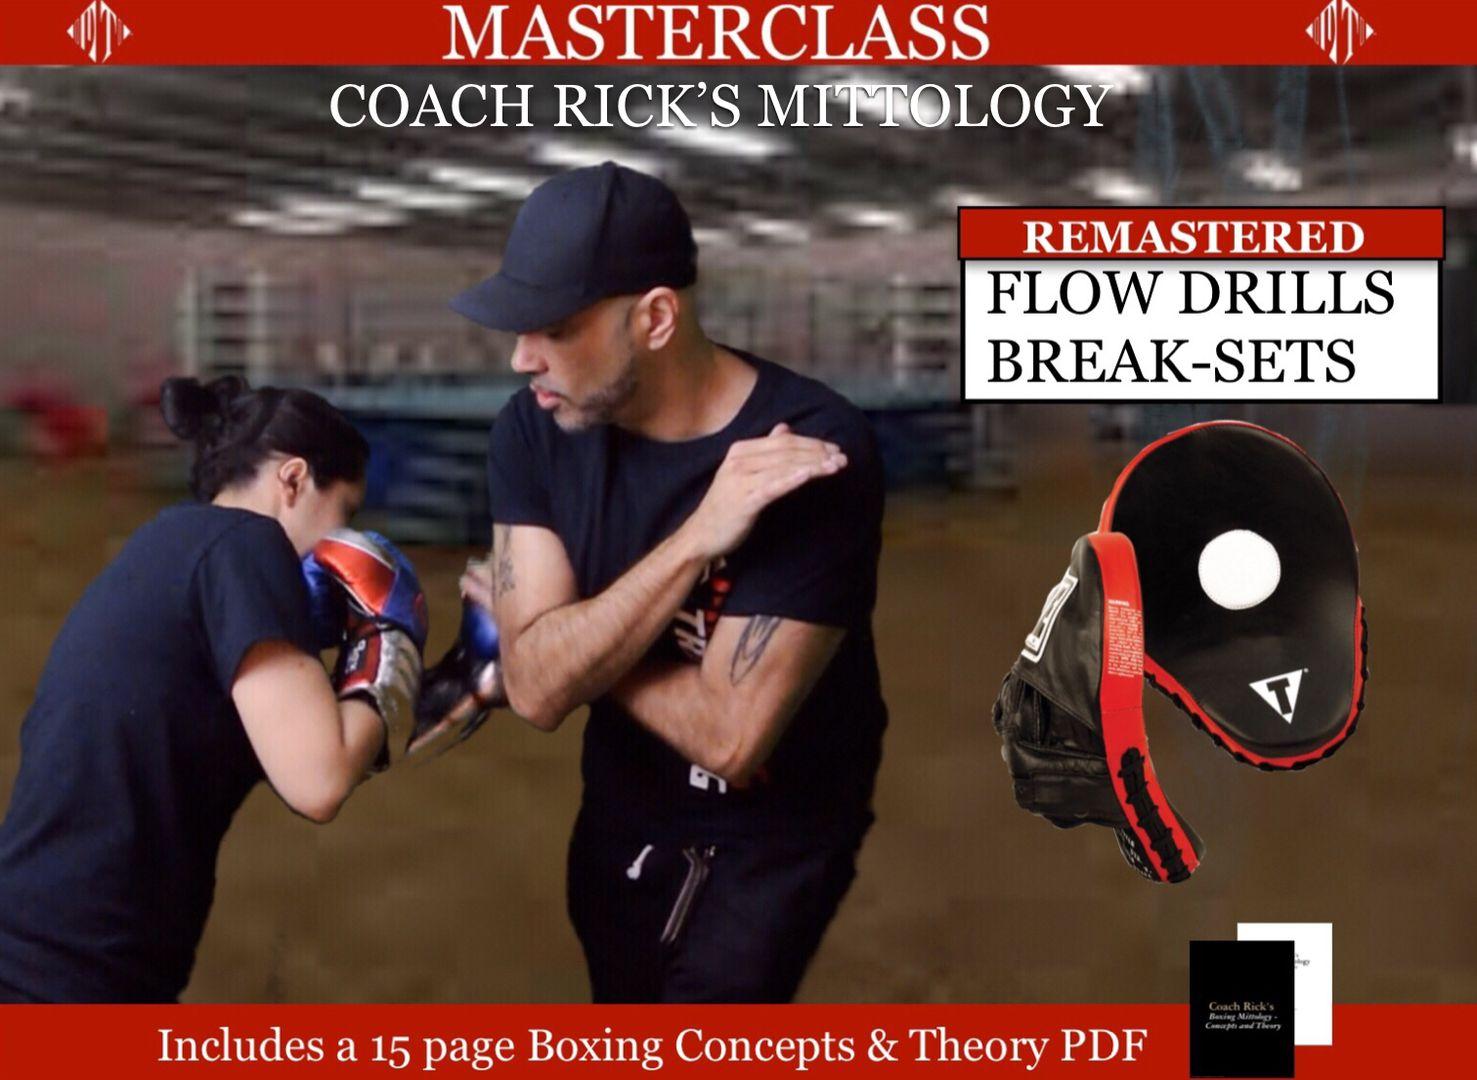 Boxing Mittwork Online Training Videos Mittology Learn Boxing Home Boxing Workout Boxing Training